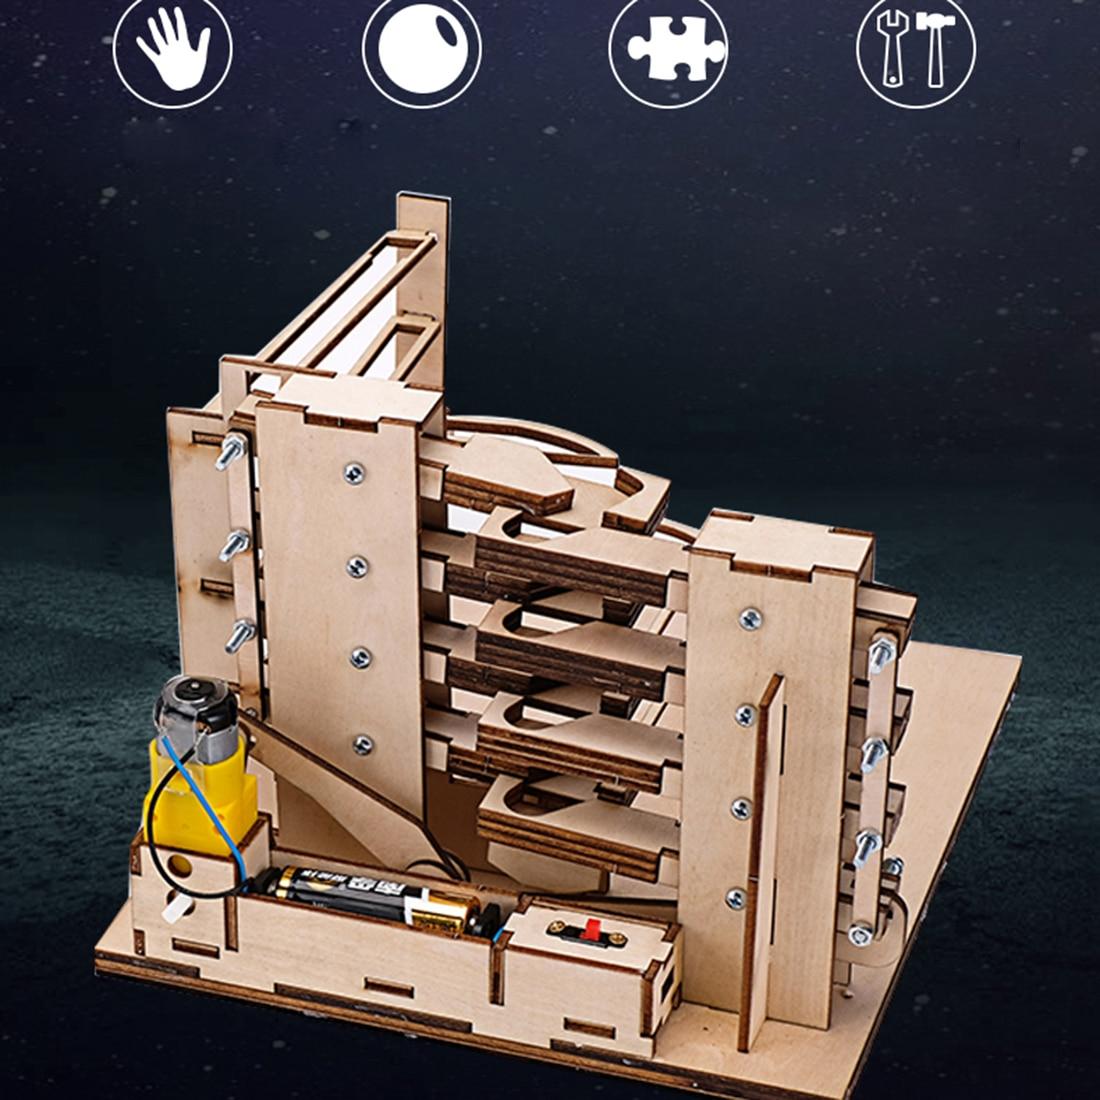 Hf201be607ea1460c8d77eb3125971d86q - Robotime - DIY Models, DIY Miniature Houses, 3d Wooden Puzzle